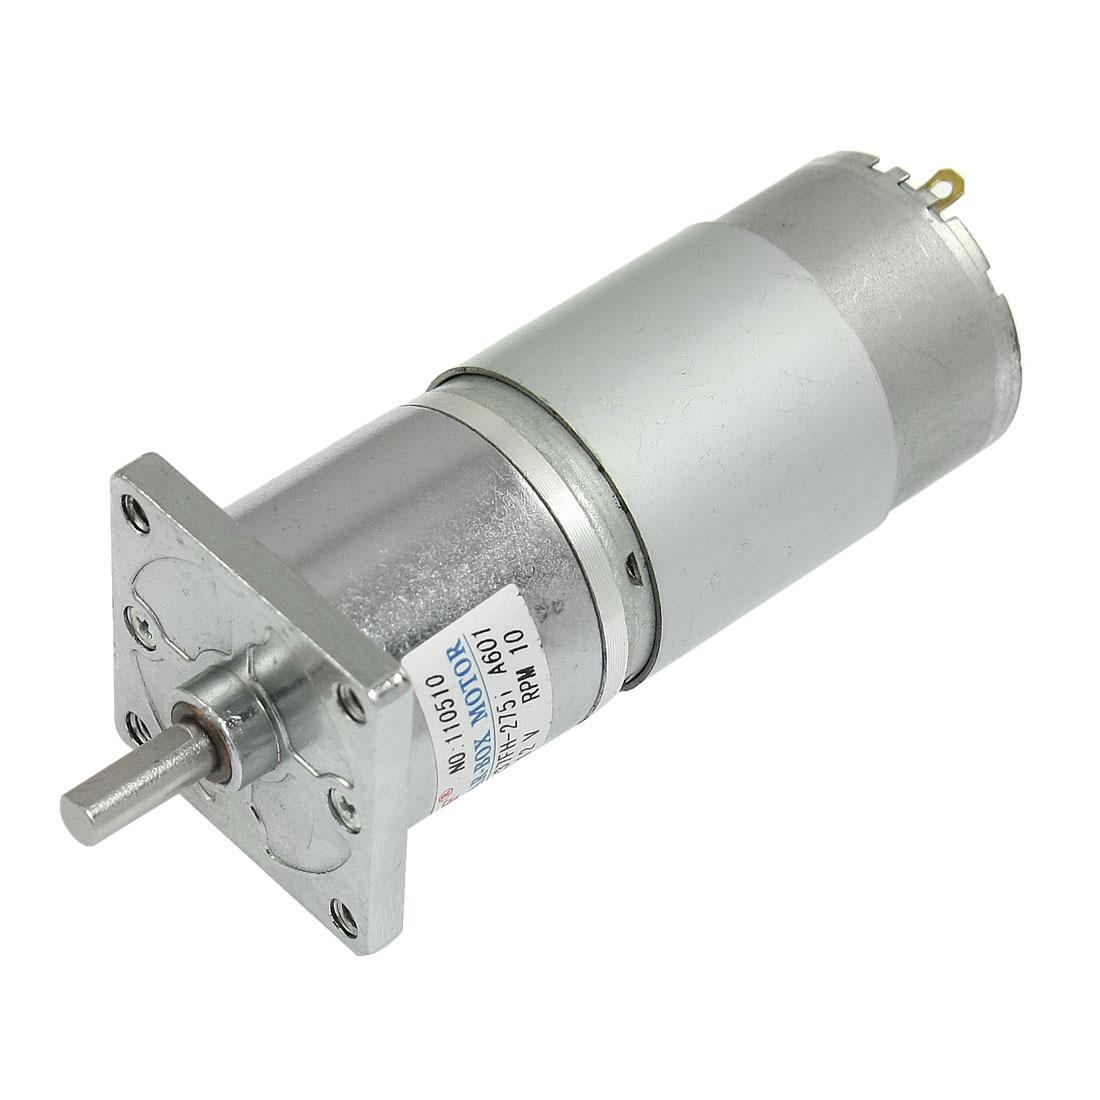 DC 12V 150mA 10RPM 20.9Kg-cm High Torque Permanent Magnetic DC Gear Motor